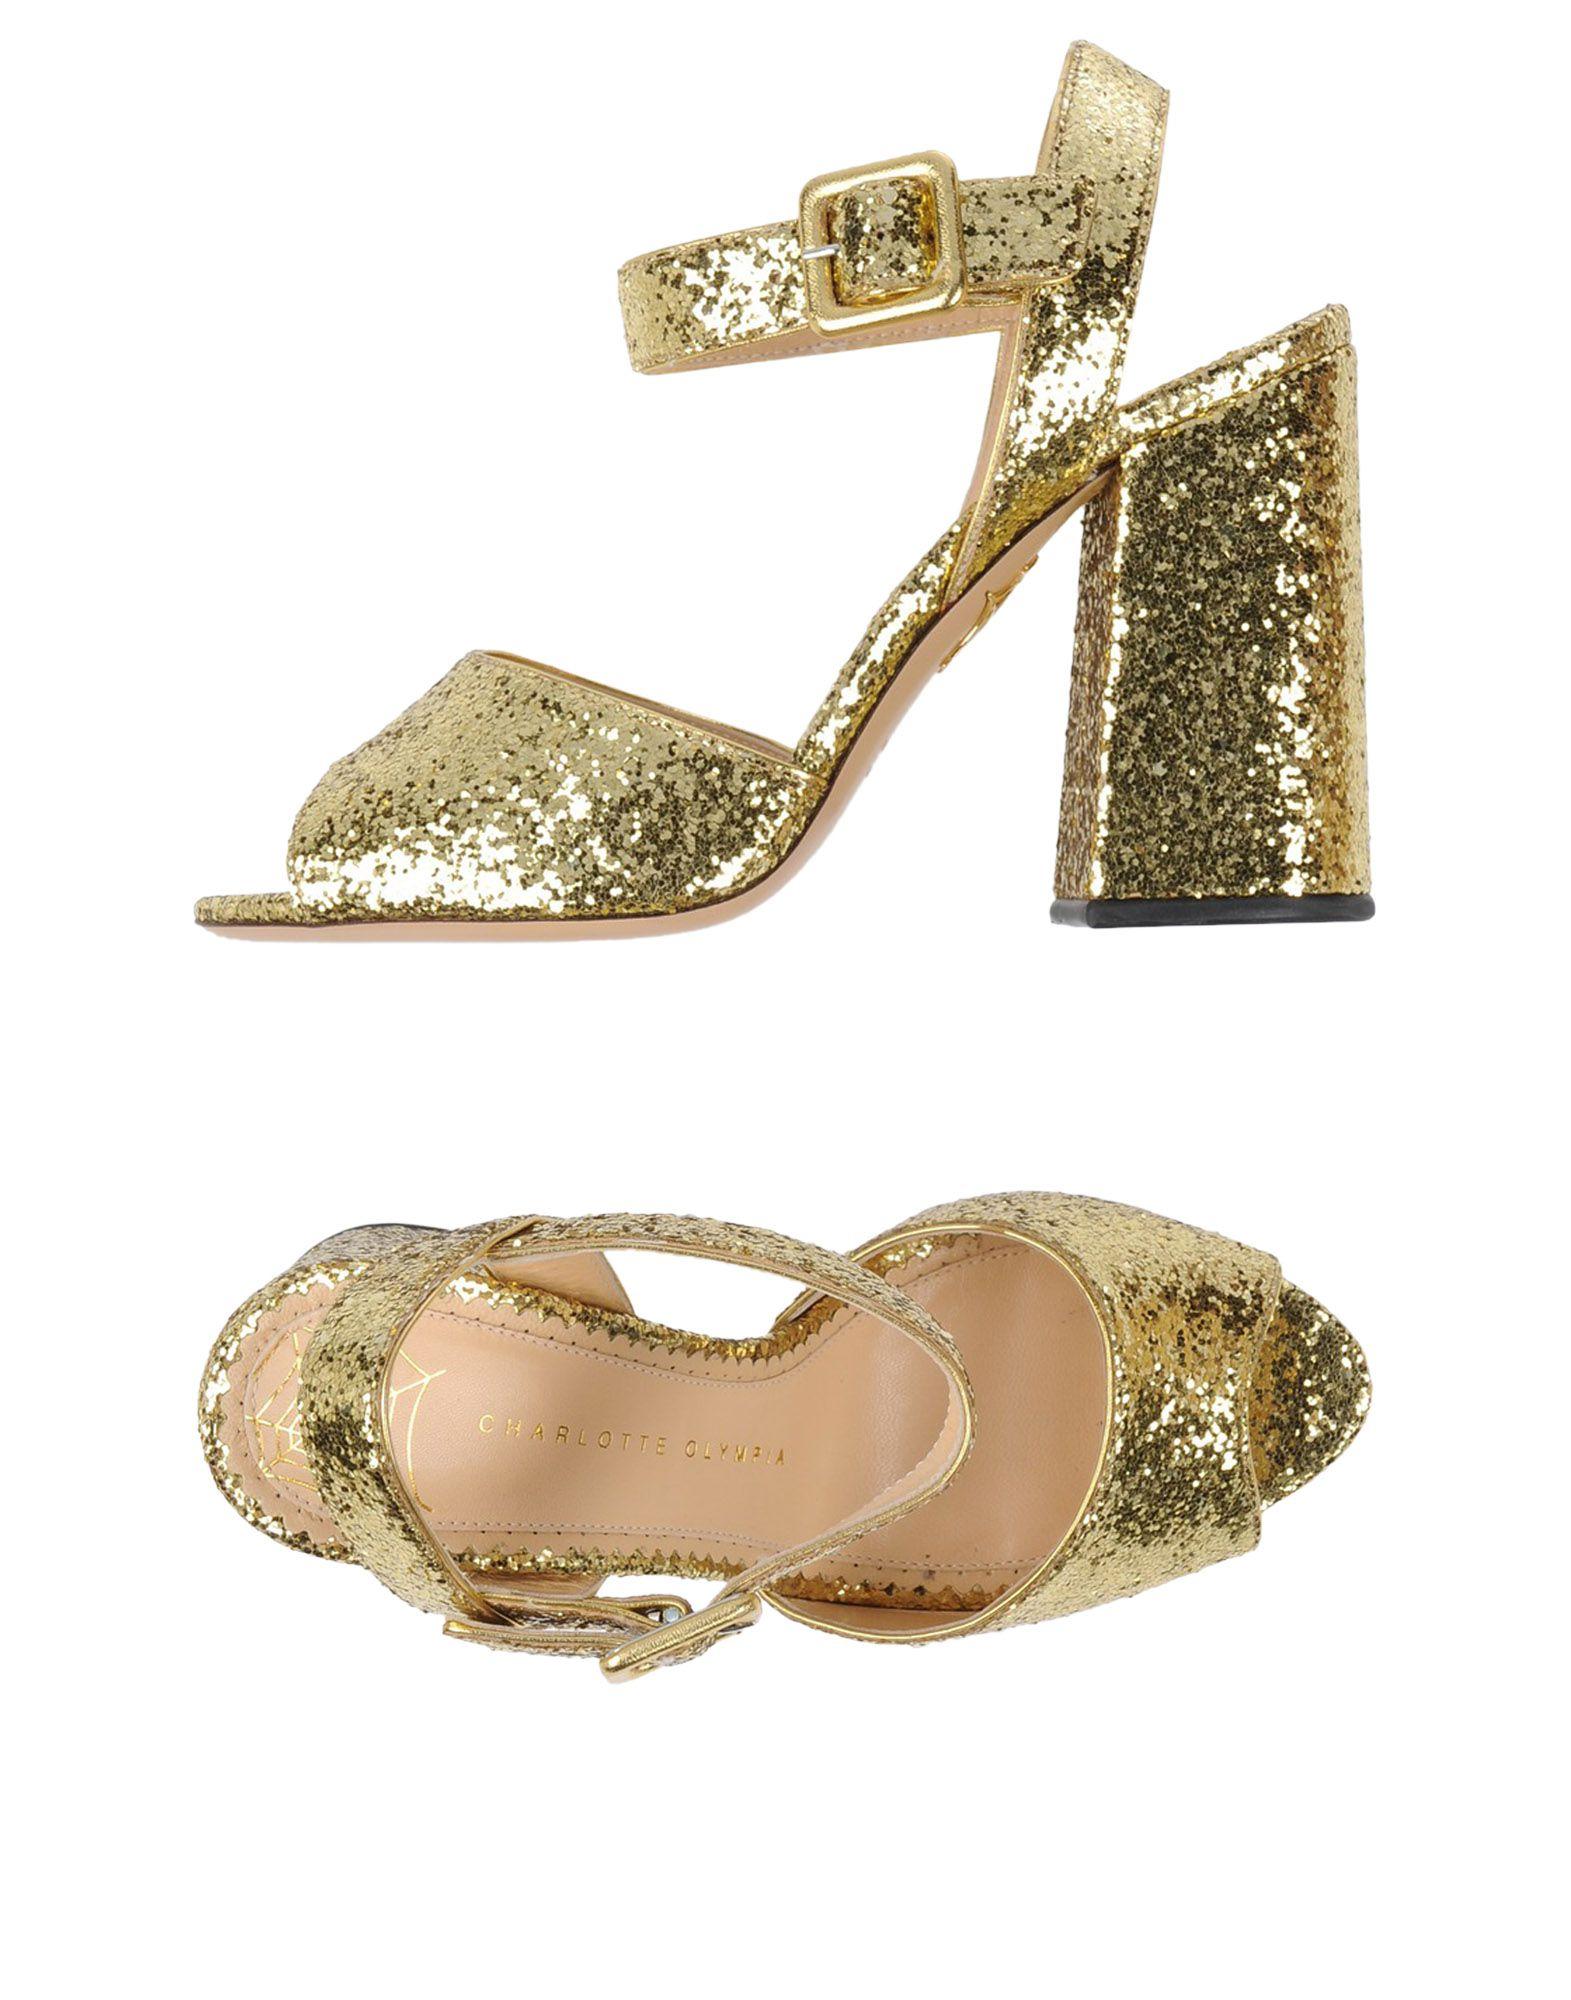 Charlotte Olympia Sandalen Damen  11477590MQGut aussehende strapazierfähige Schuhe